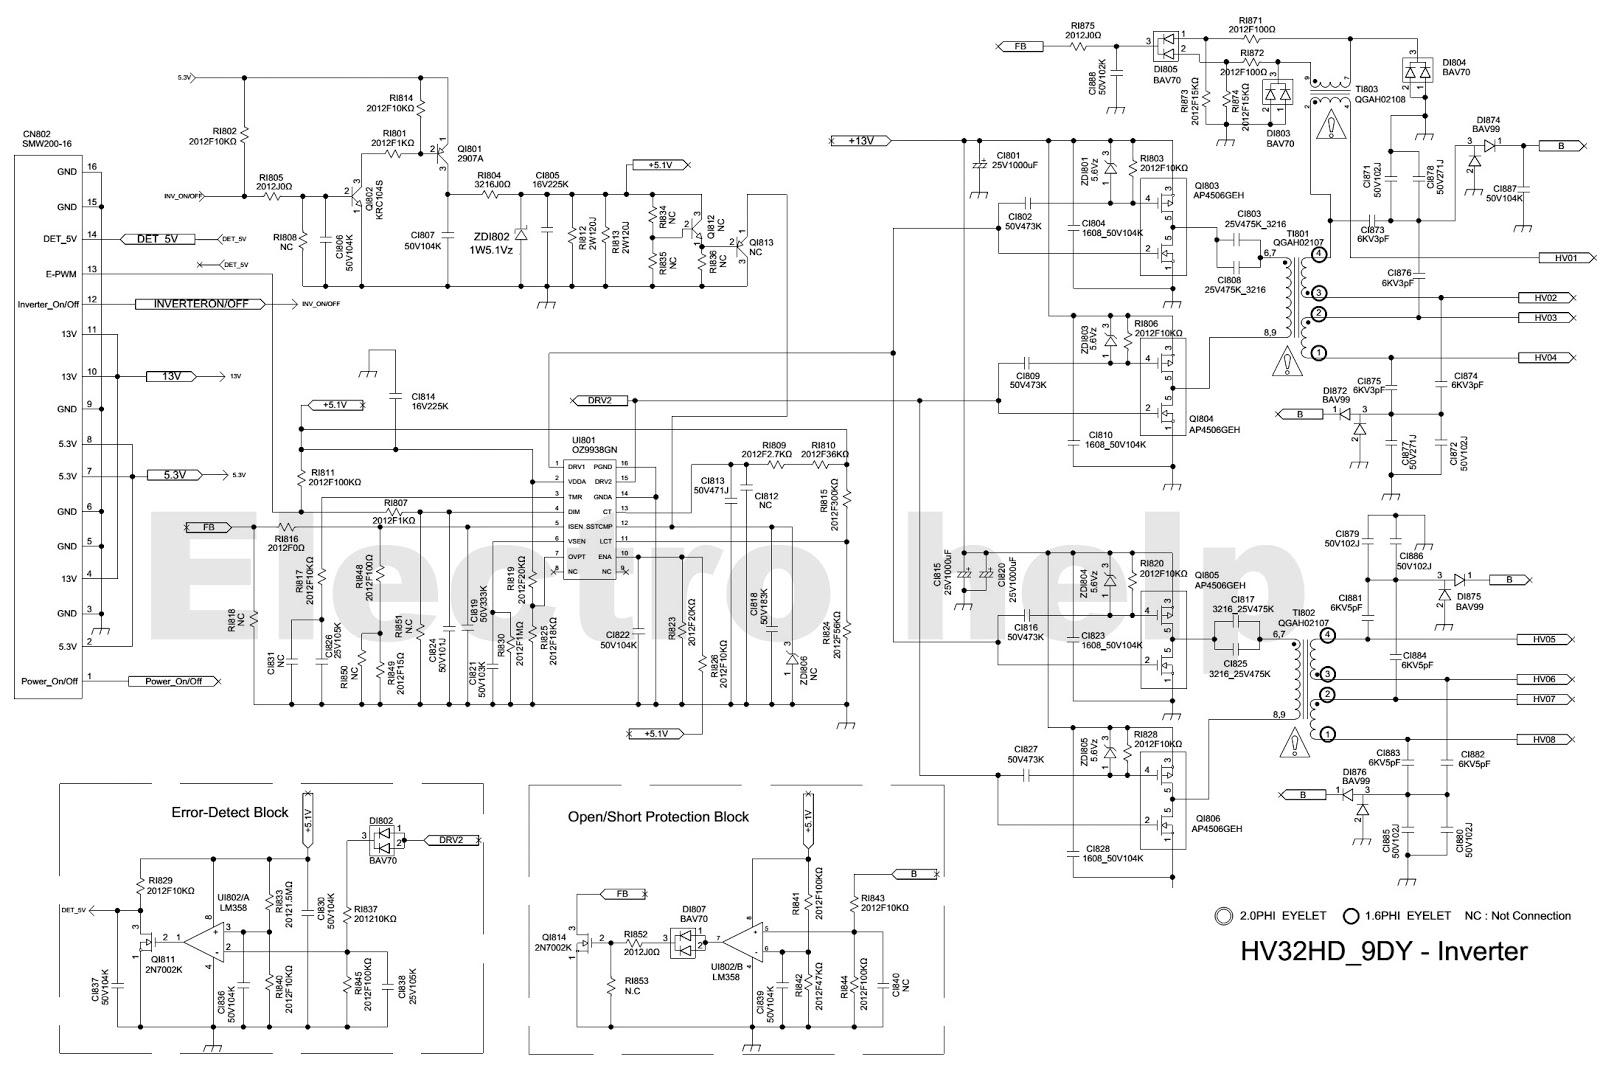 SAMSUNG LCD TV Power Supply BN44 00438A HV332HD Power and Back light